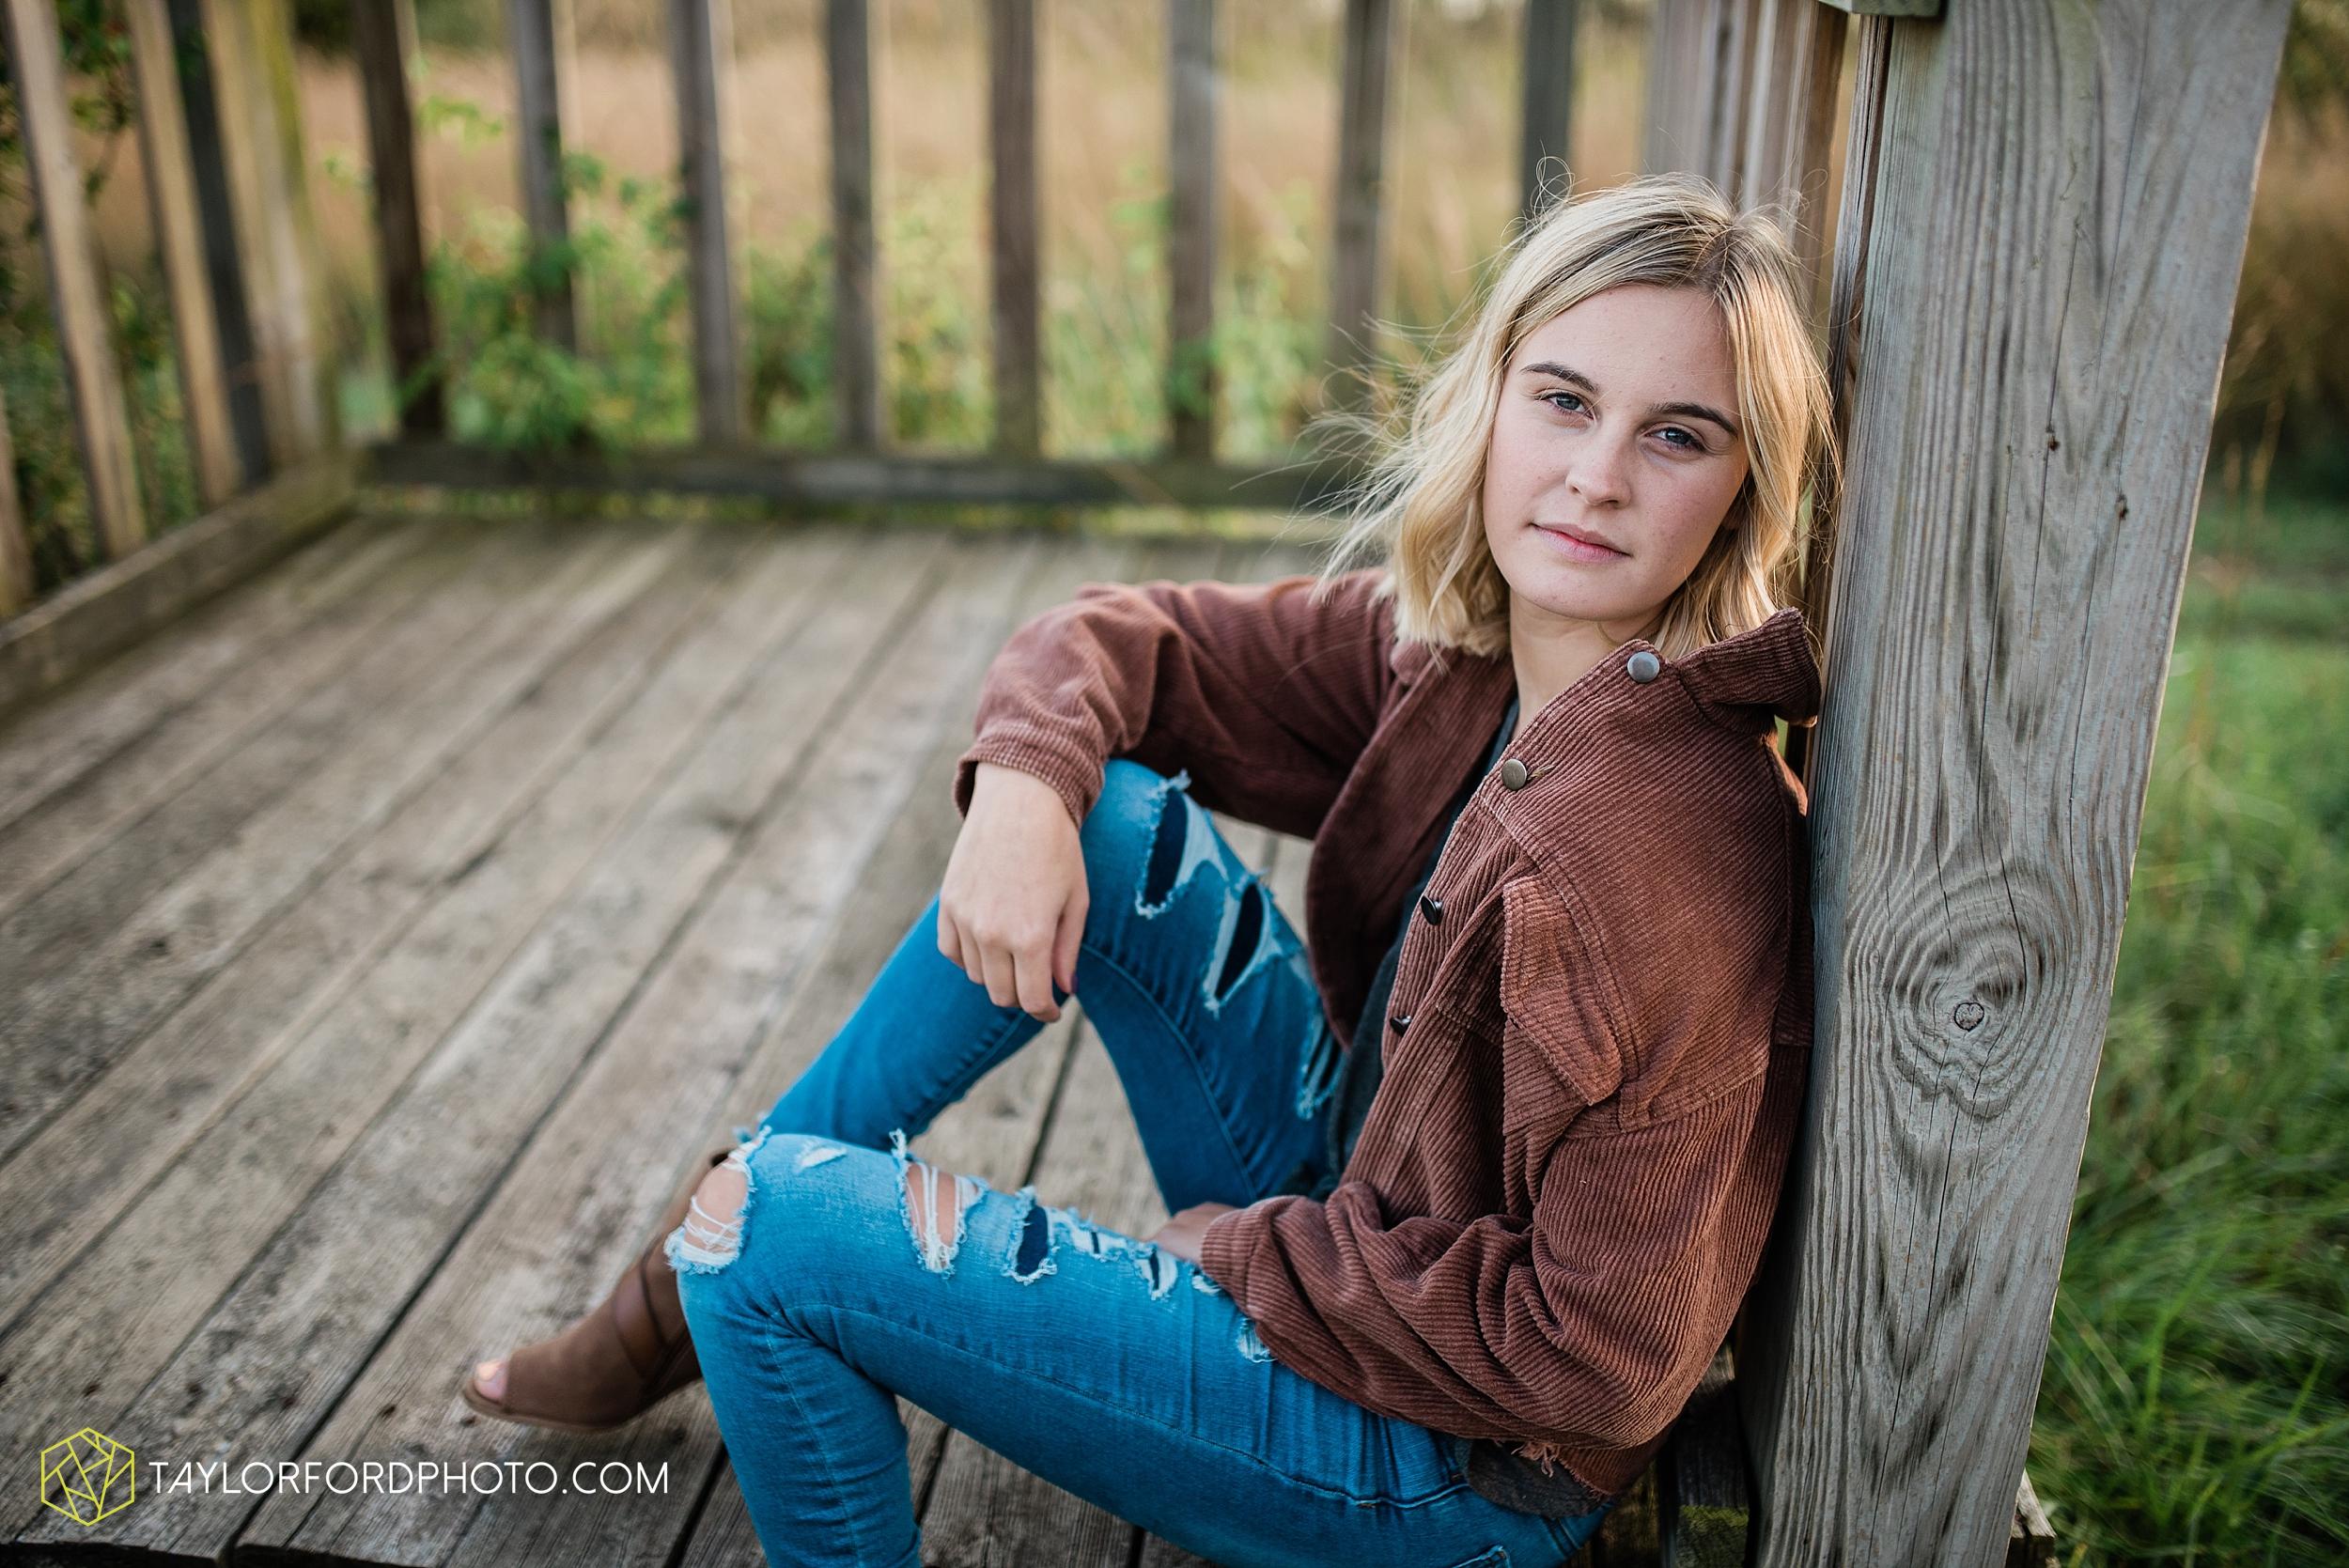 van-wert-high-school-ohio-senior-girl-downtown-cougar-photographer-taylor-ford-photography_0952.jpg